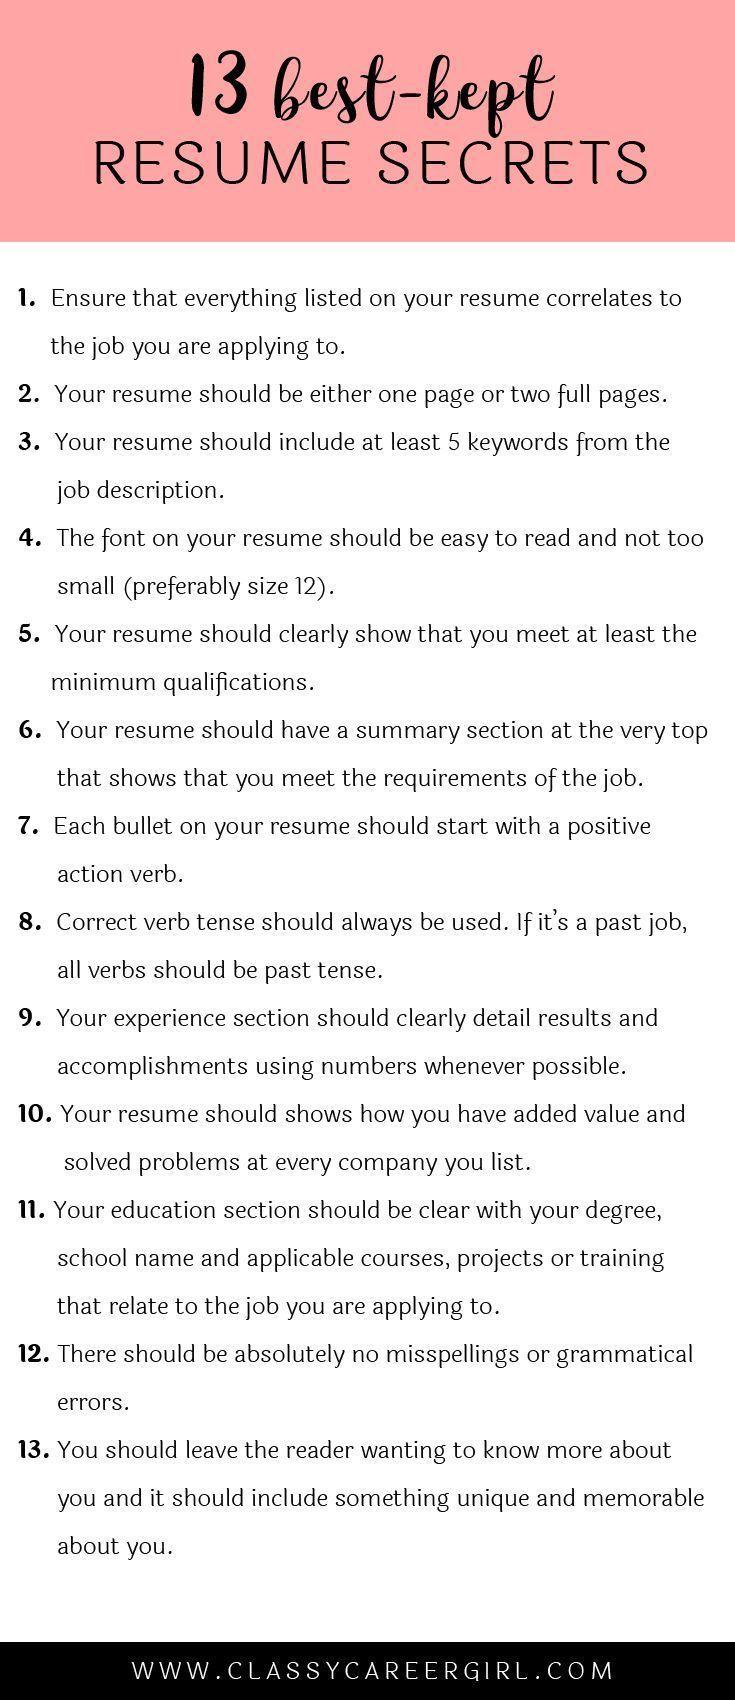 the 13 best kept resume secrets pinterest startups tossed and